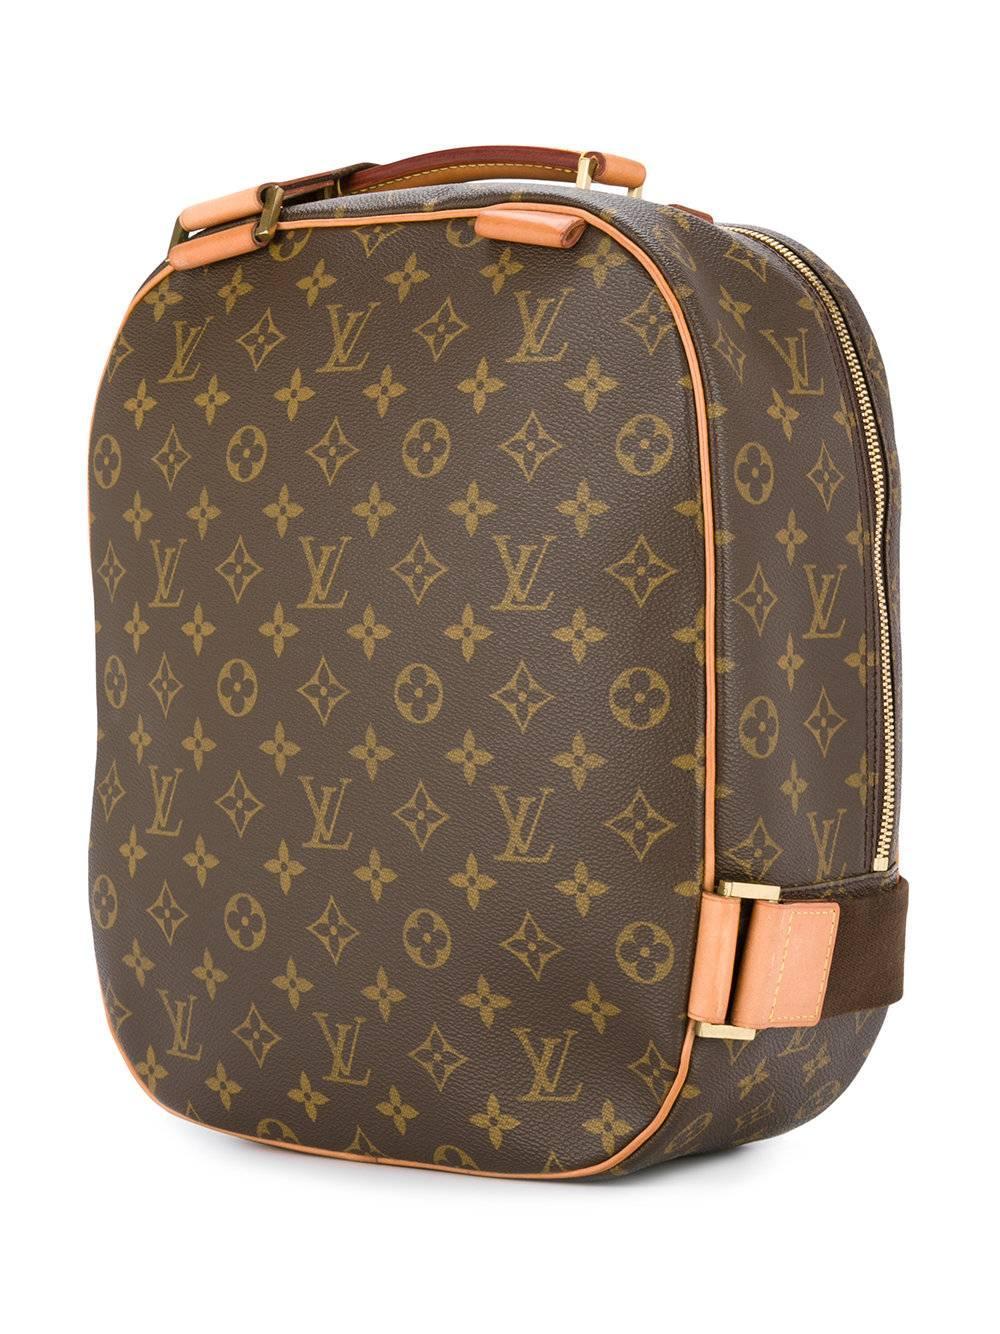 cf5fa9d8fc5f Louis Vuitton Monogram Men s Women s Carryall Travel One Shoulder Backpack  Bag For Sale at 1stdibs